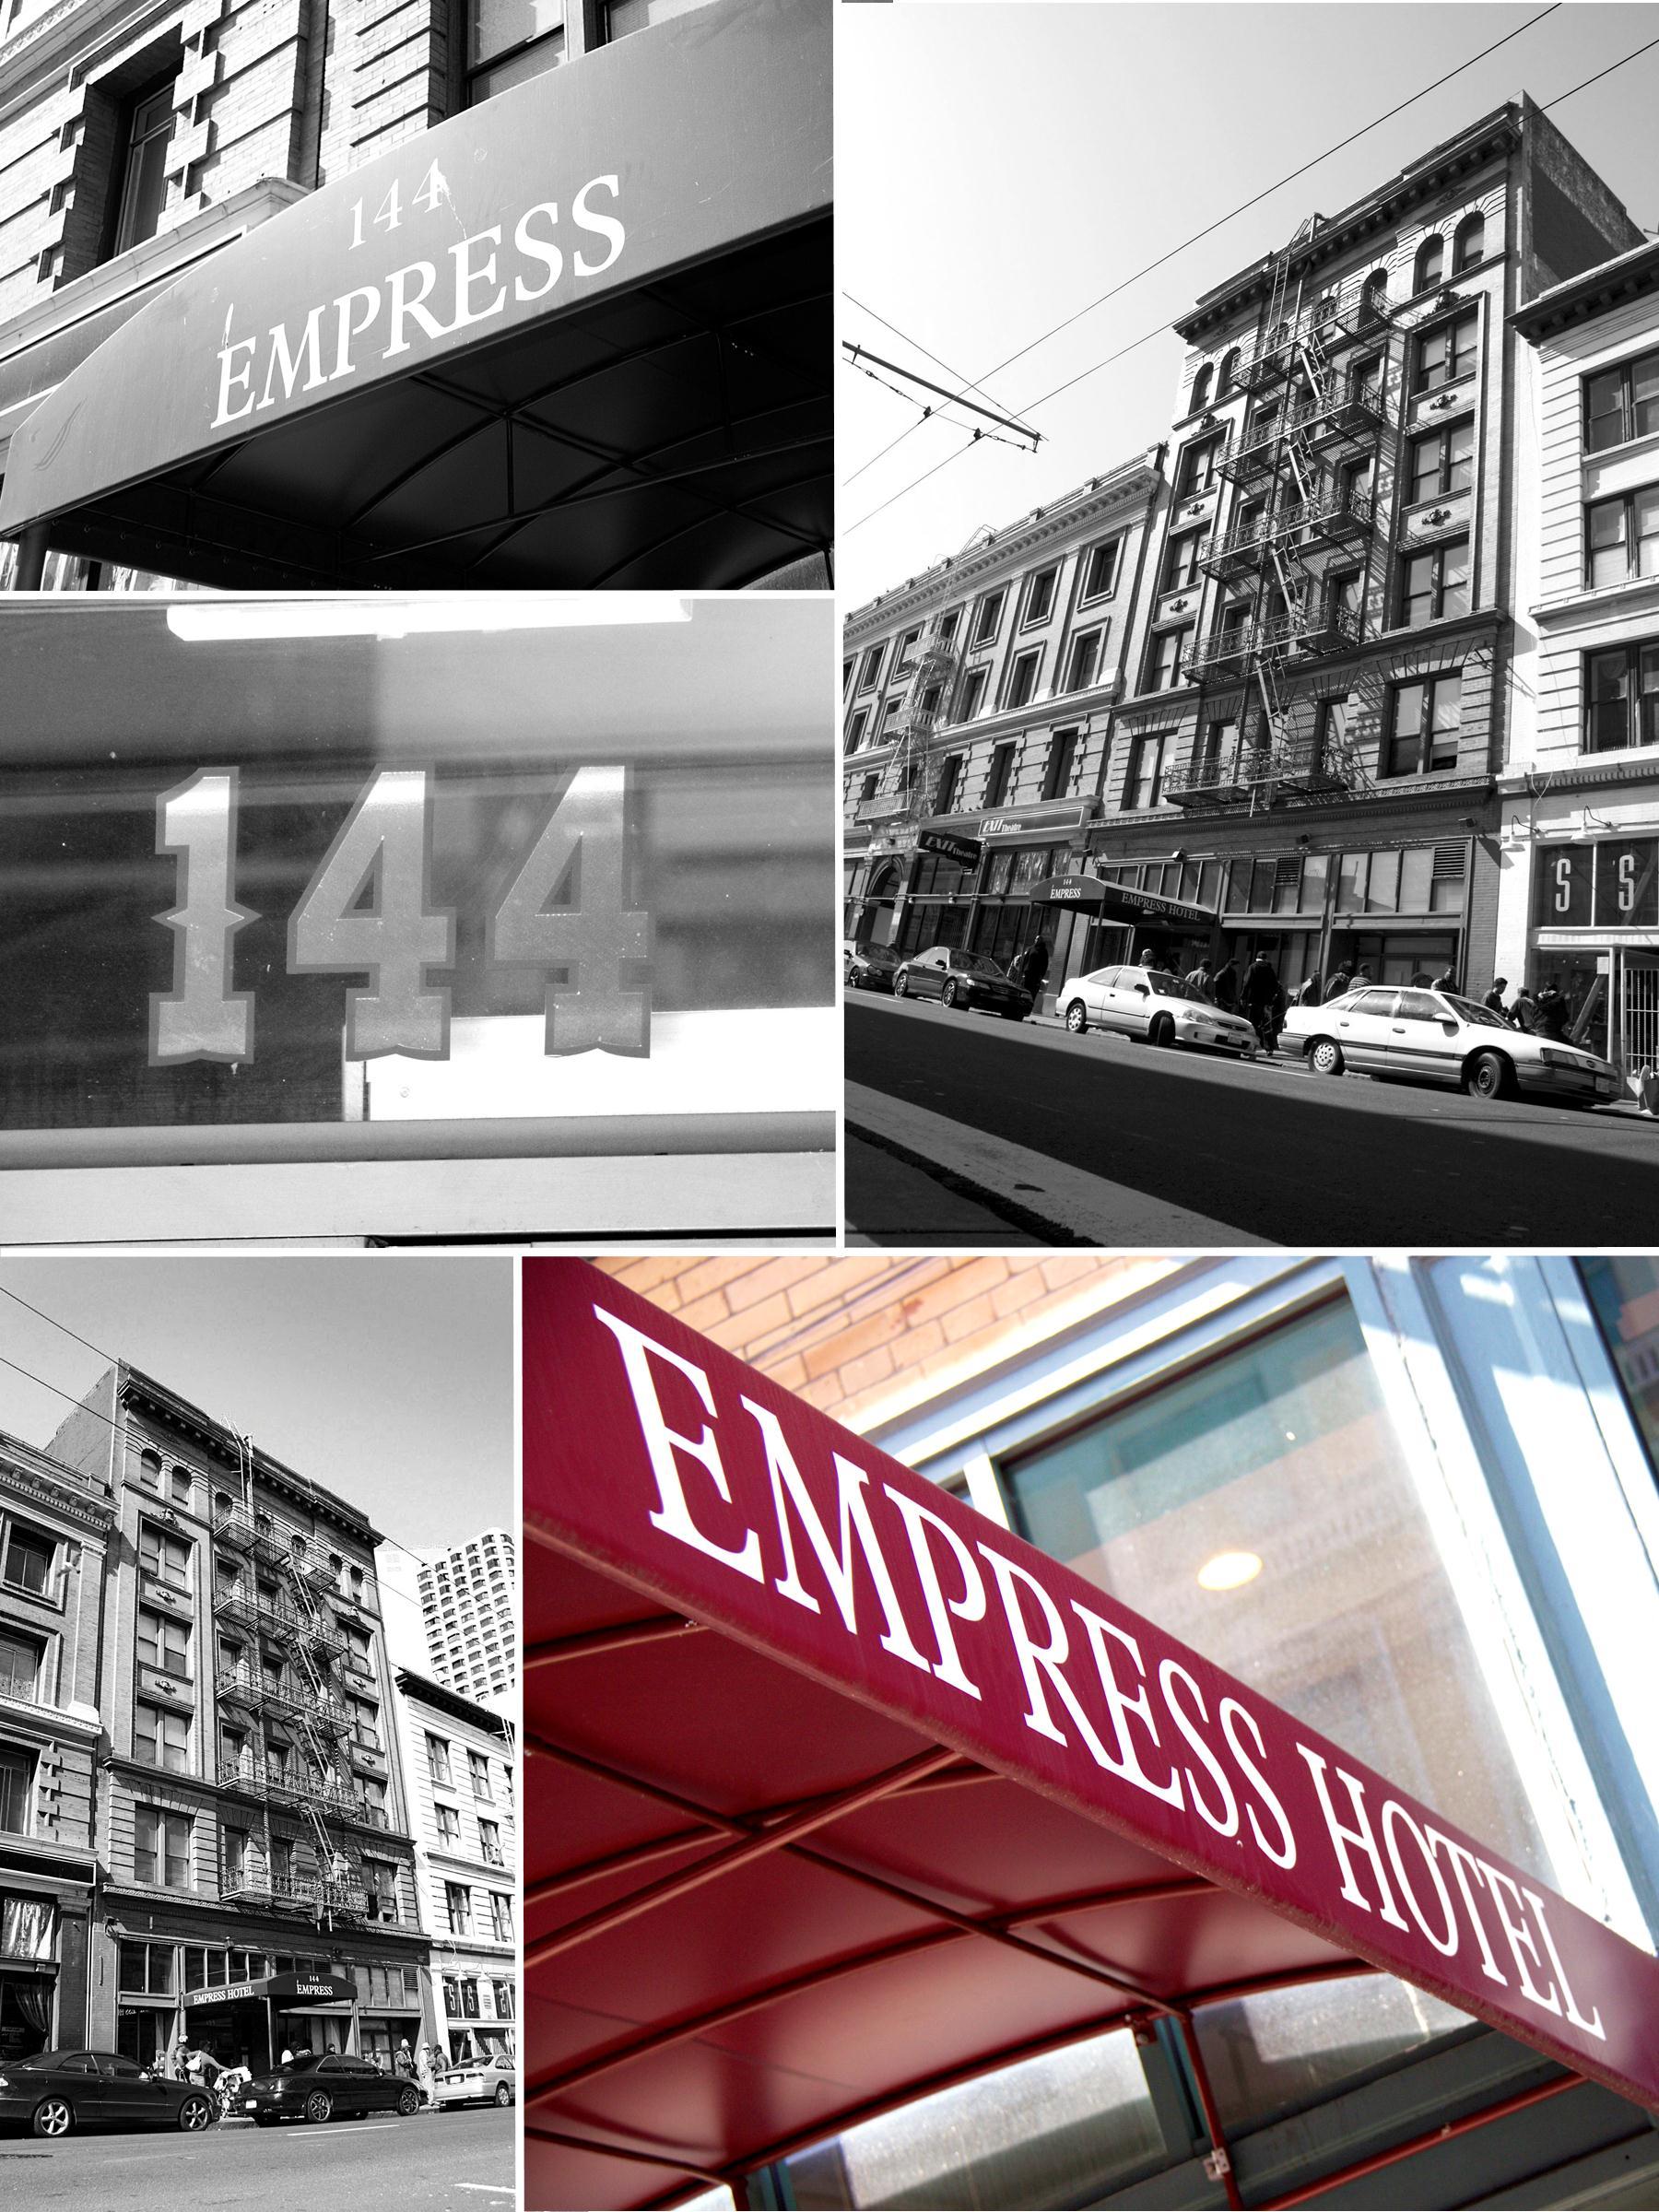 Empress.Collage.1